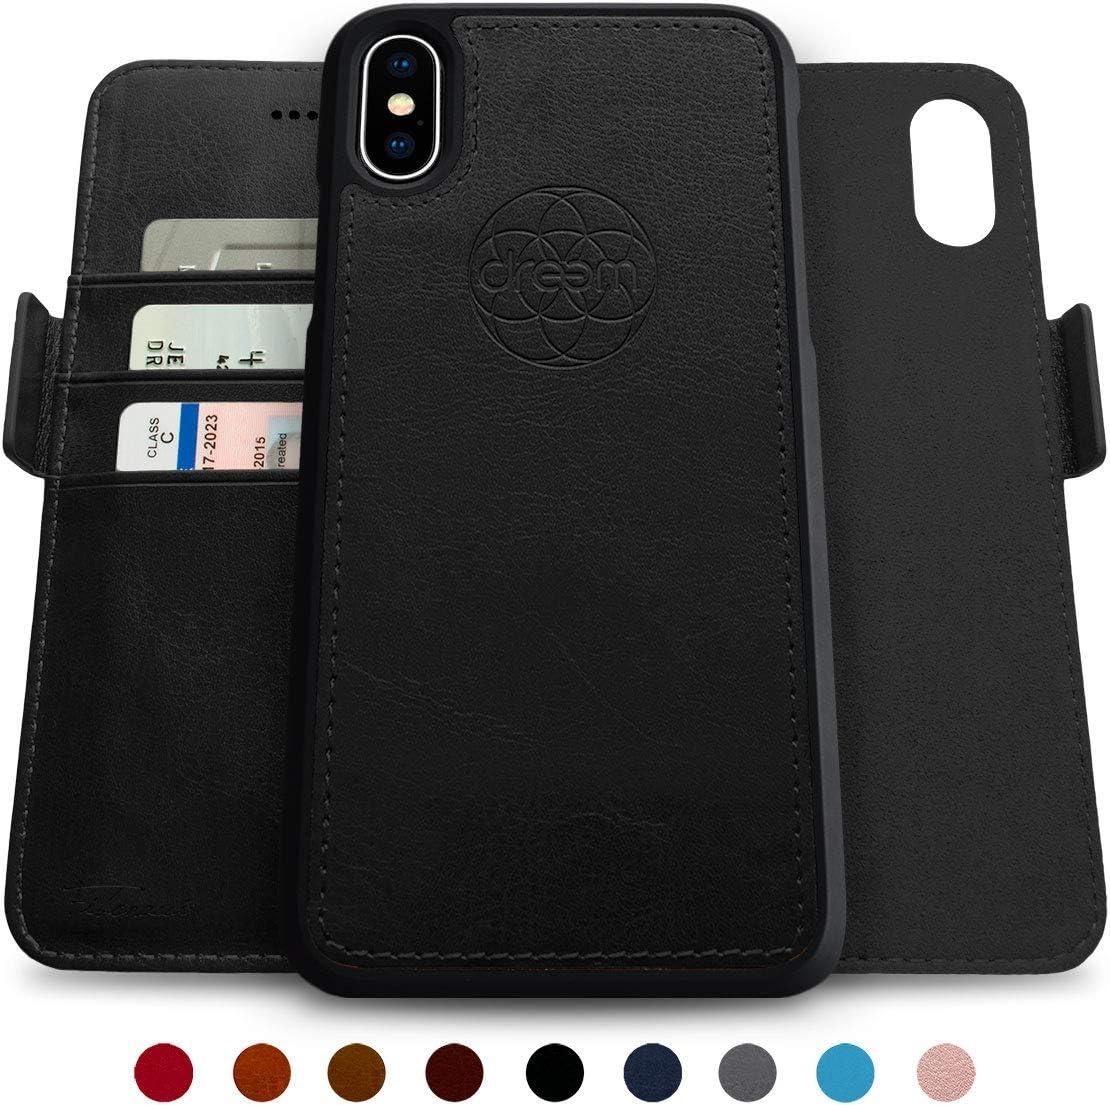 Dreem Fibonacci 2-in-1 Wallet-Case for iPhone X & Xs, Magnetic Detachable Shock-Proof TPU Slim-Case, RFID Protection, 2-Way Stand, Luxury Vegan Leather, GiftBox - Black